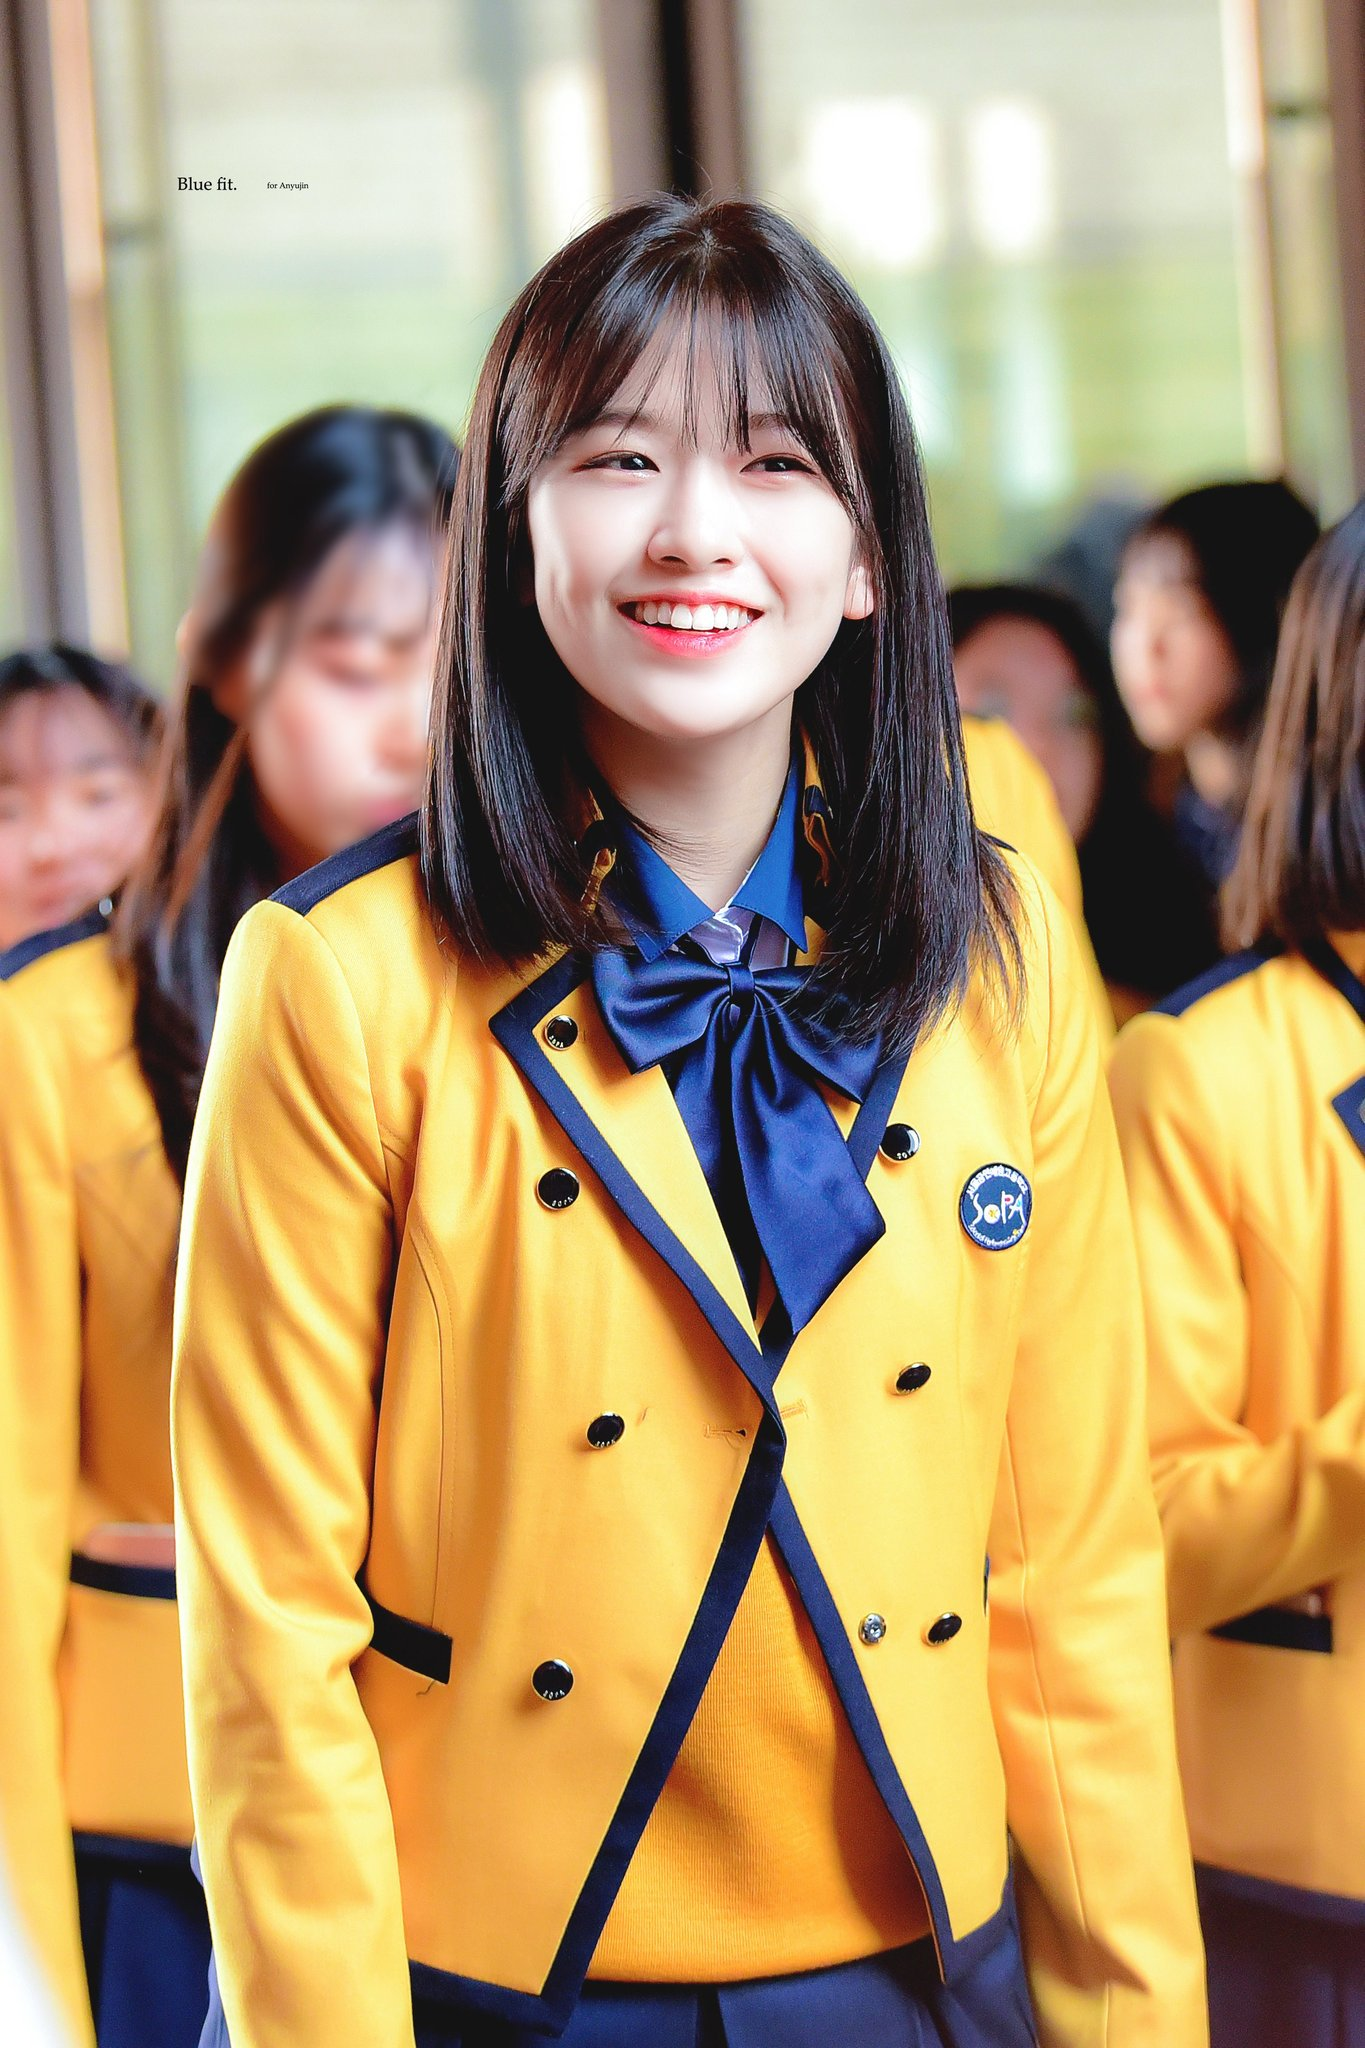 izone, izone profile, izone facts, izone age, izone height, izone leader, izone high school, izone comeback, izone weight, izone yujin, yujin